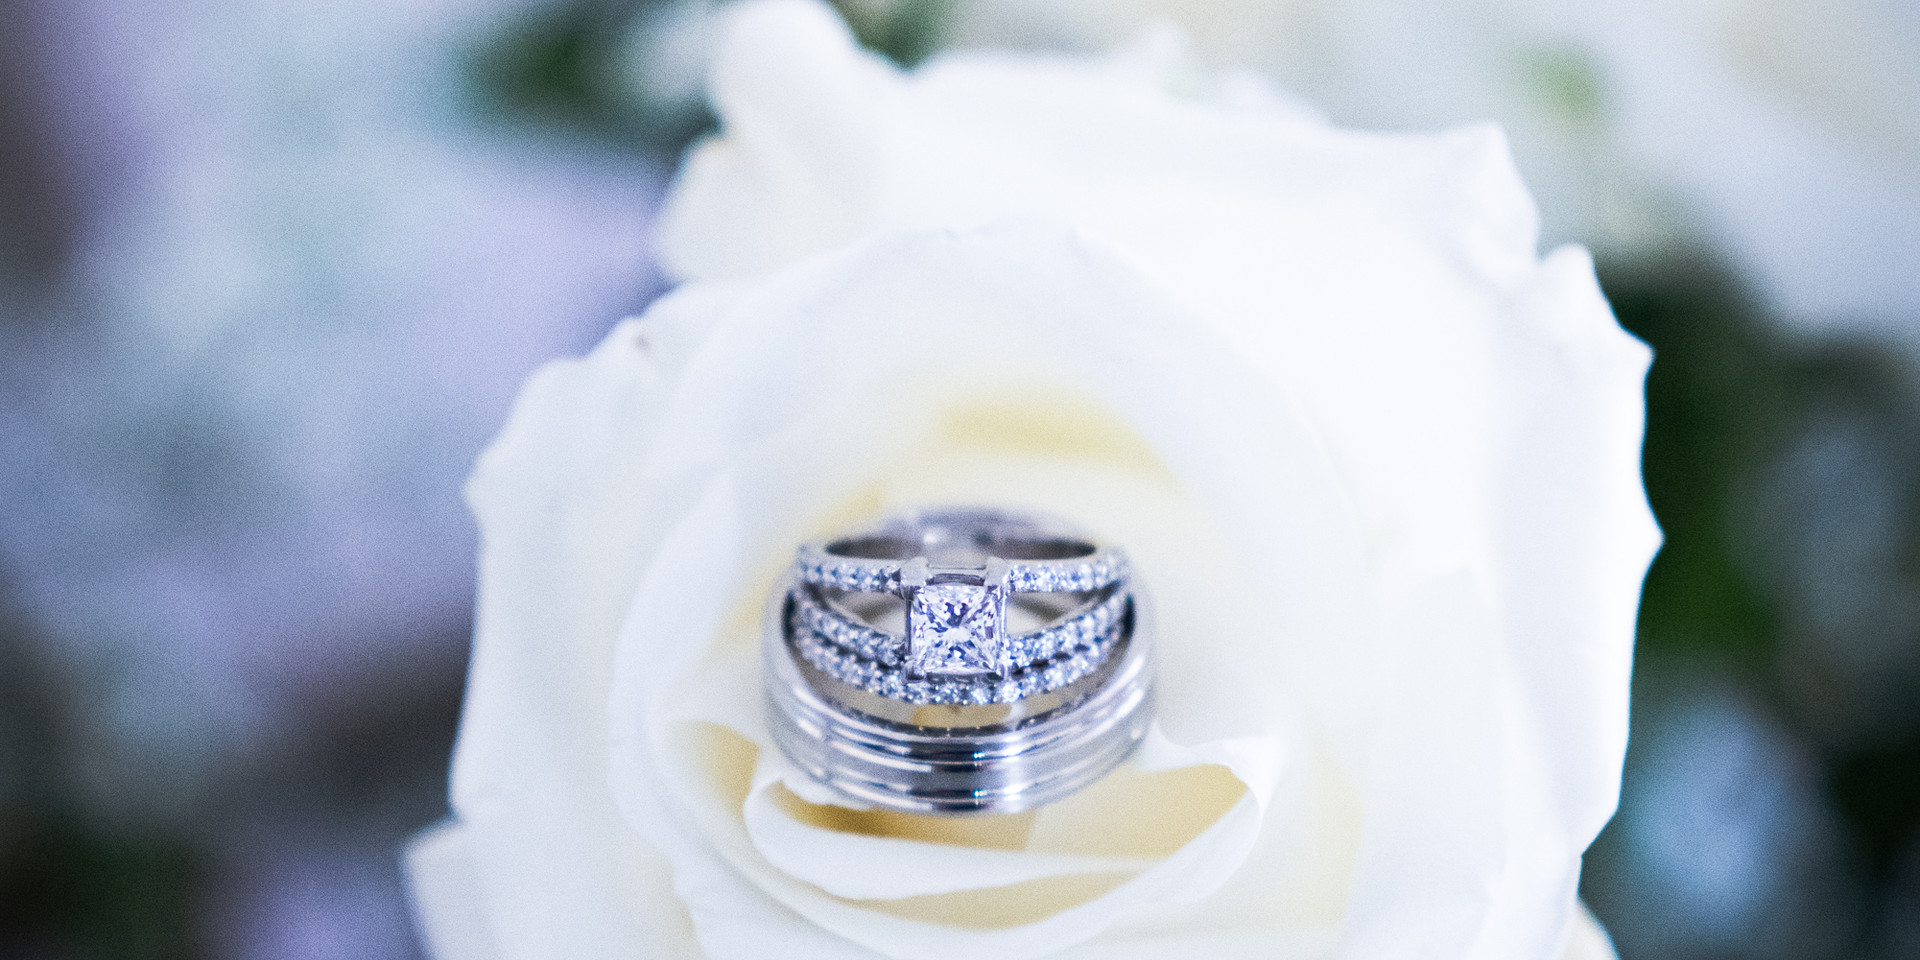 Detail Ring photograph